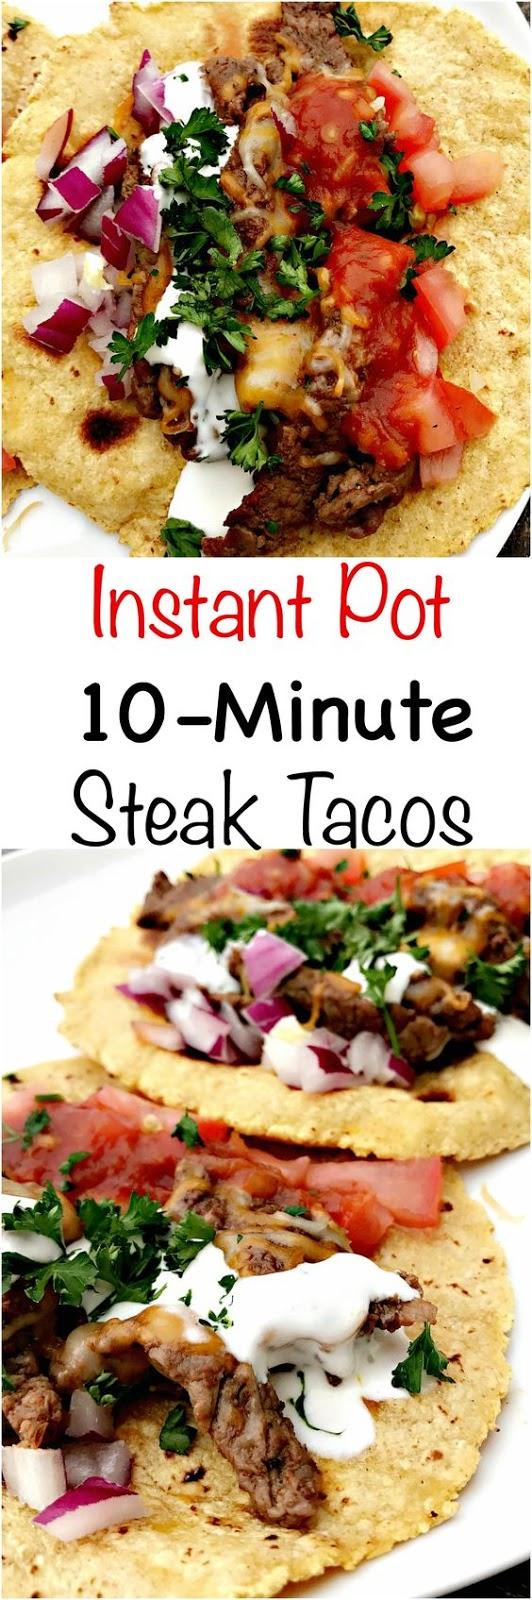 Instant Pot 10-Minute Steak Tacos (Carne Asada)